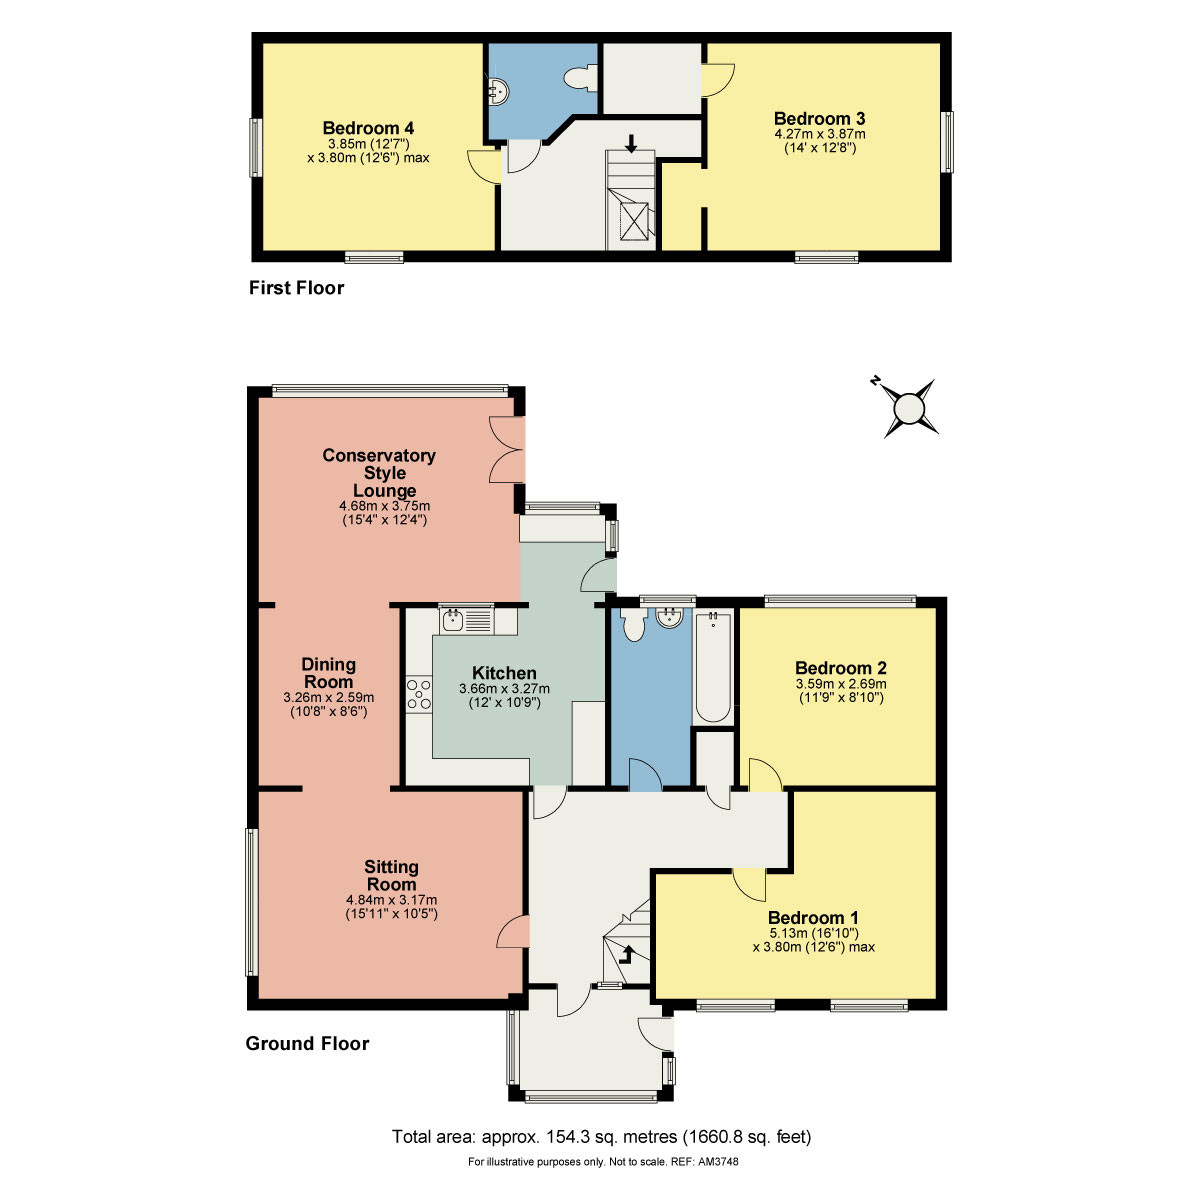 Floorplan 13 Beck Yeat, Coniston, Cumbria LA21 8HT